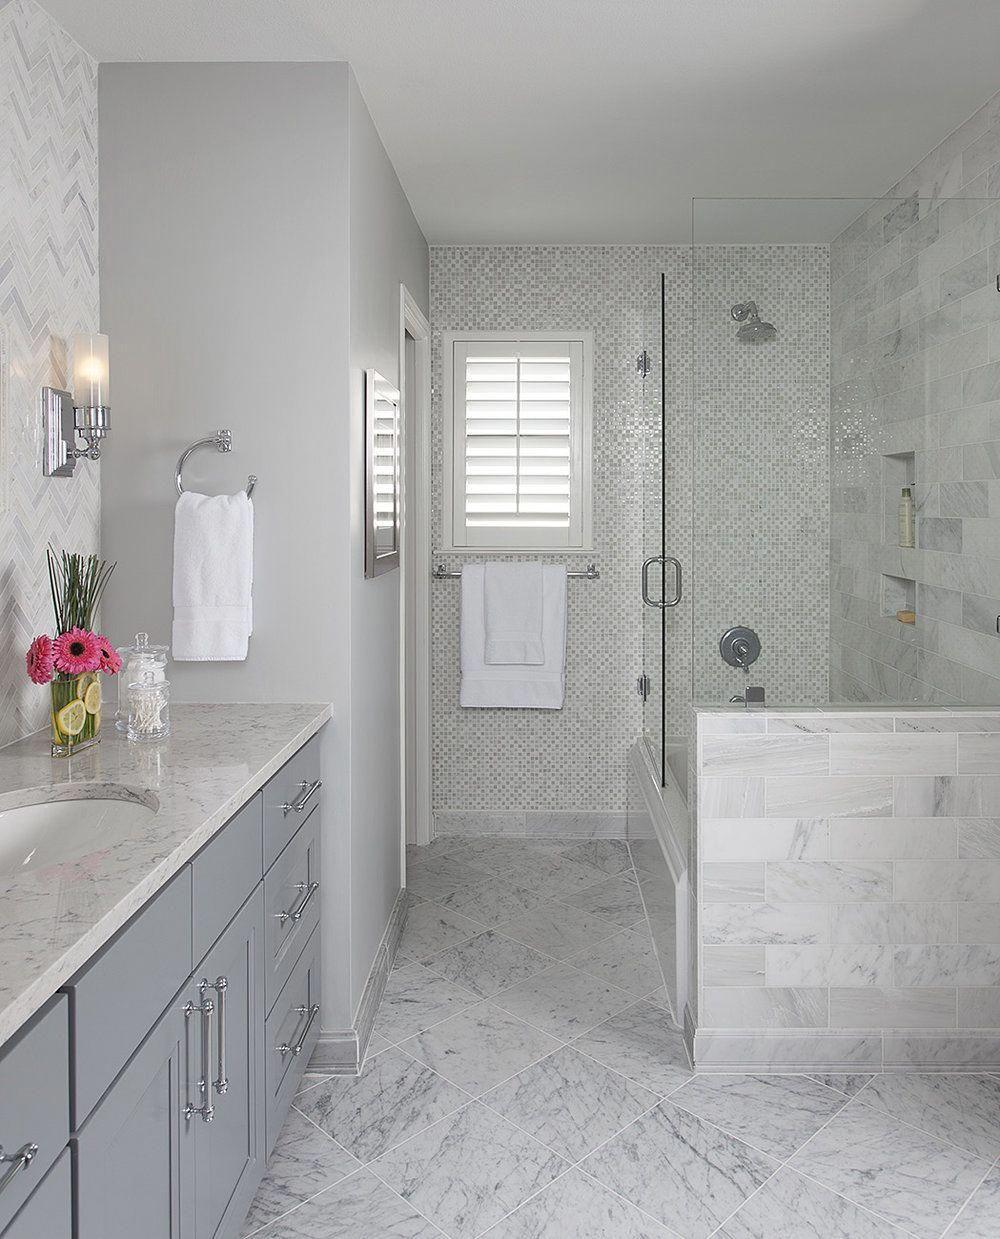 minimalist bathroom shower curtain smallbathroomdark code